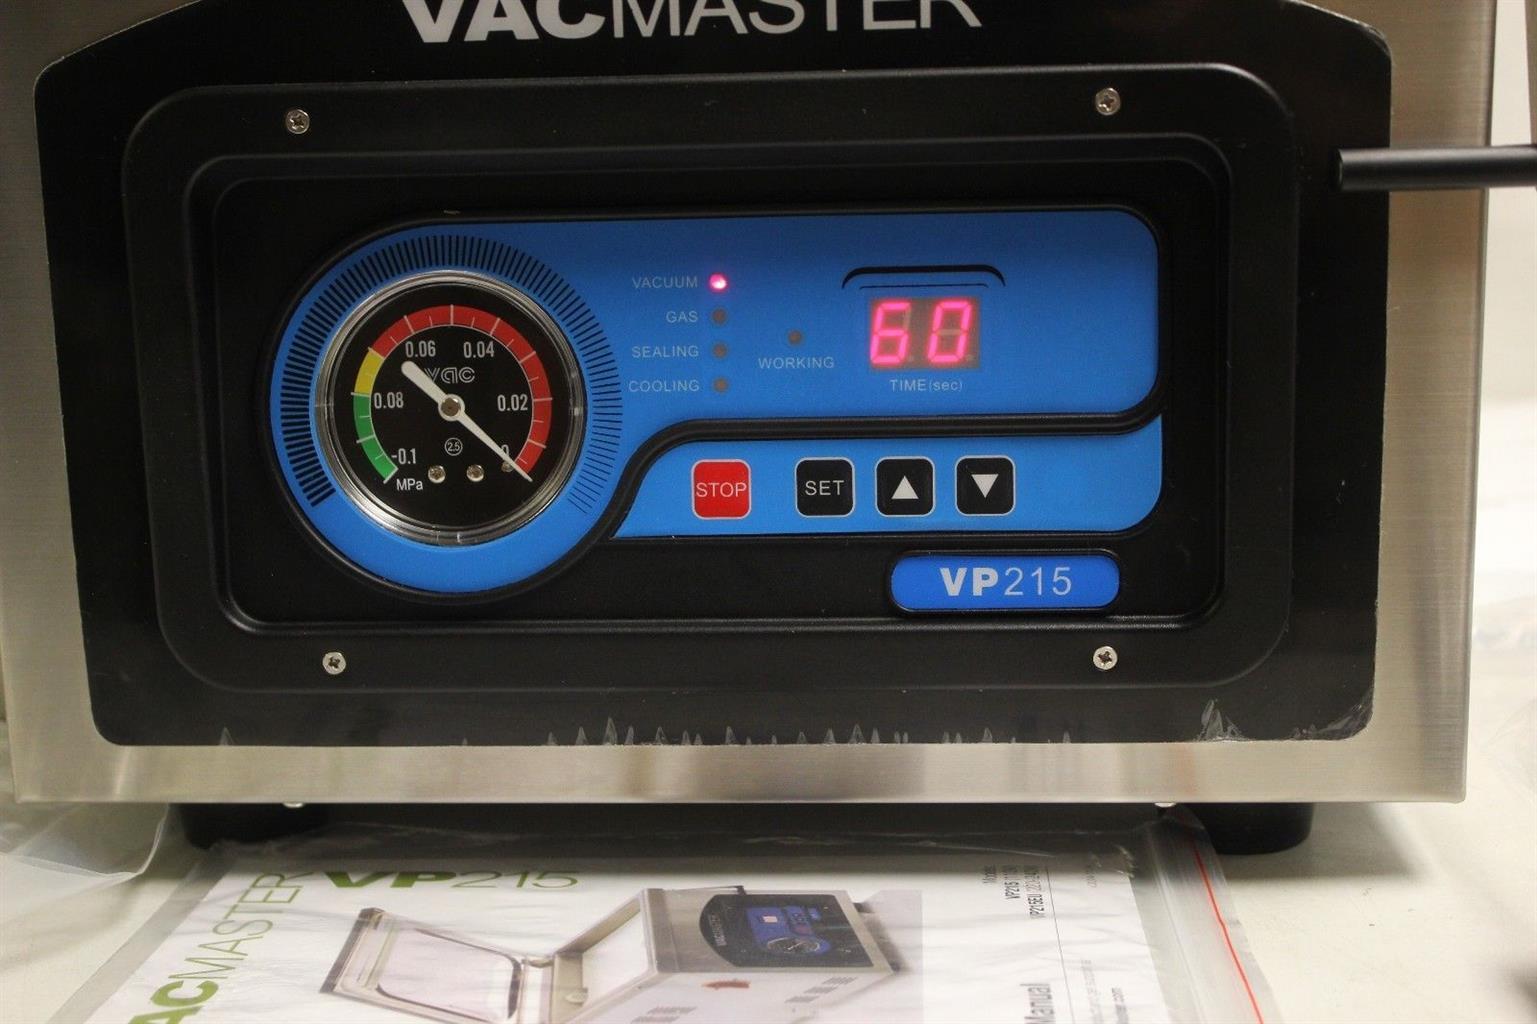 Chamber vacuum sealer machine for sale